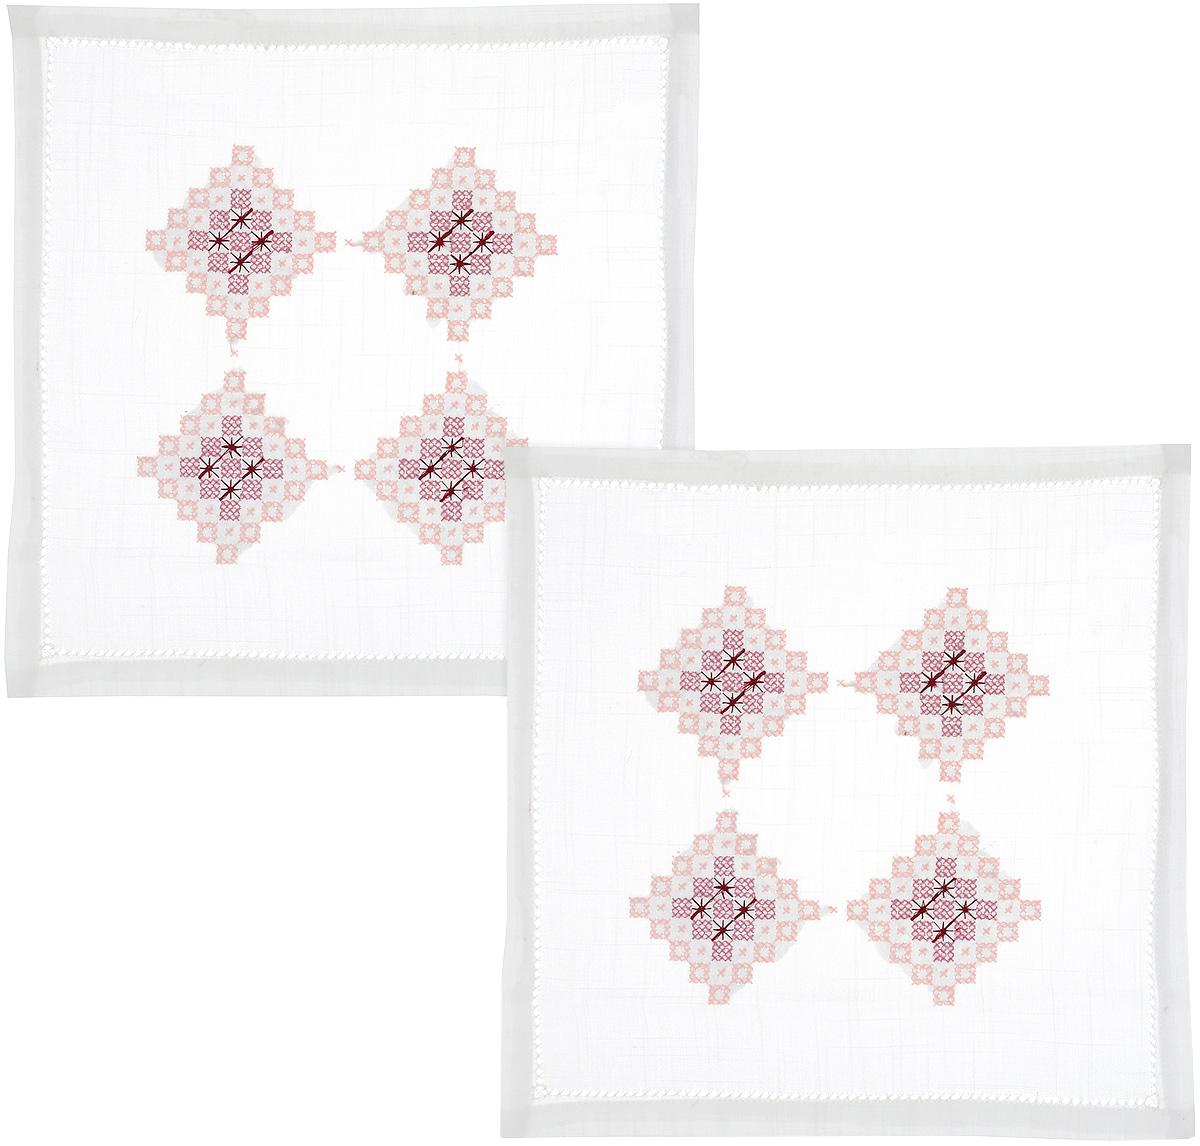 Набор домашнего текстиля, 100% полиэстер (Наволочка, 40 х 40 см)6610/248